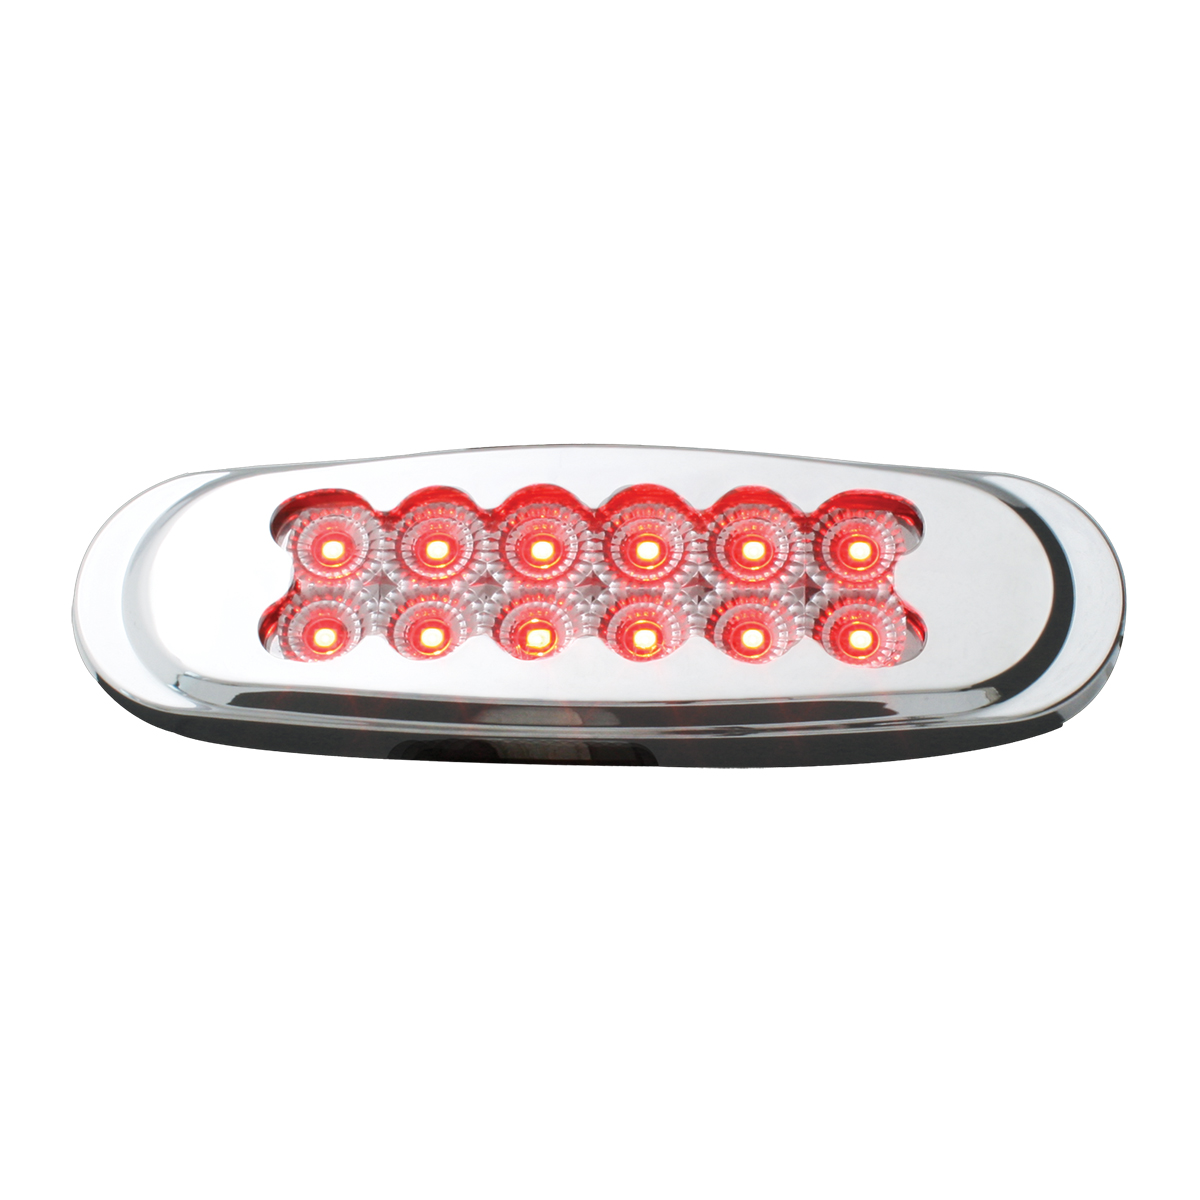 76708 Ultra Thin Dual Function Spyder LED Light w/ Chrome Plastic Matrix Bezel